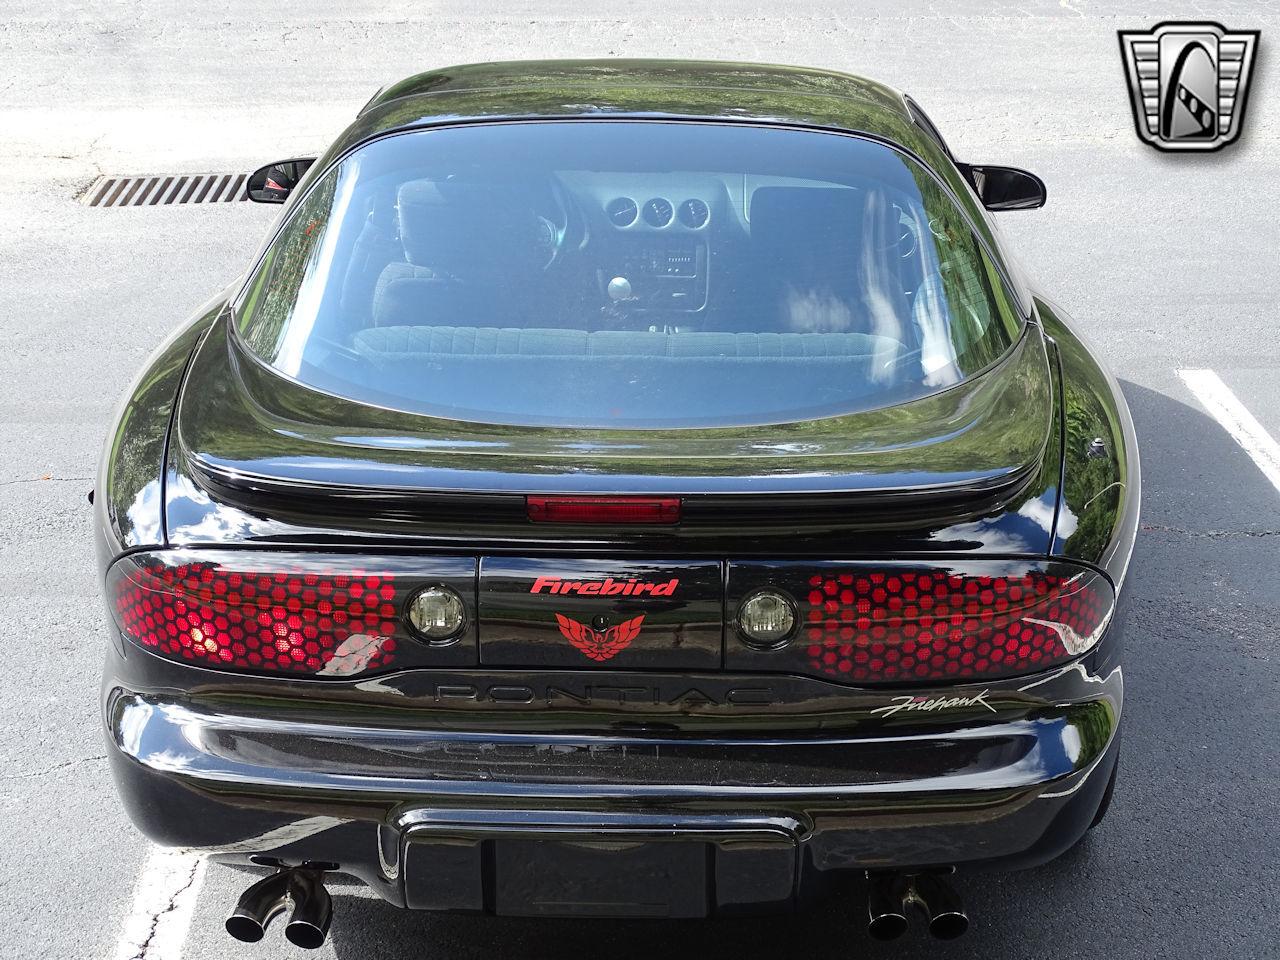 2001 Pontiac Firebird 30